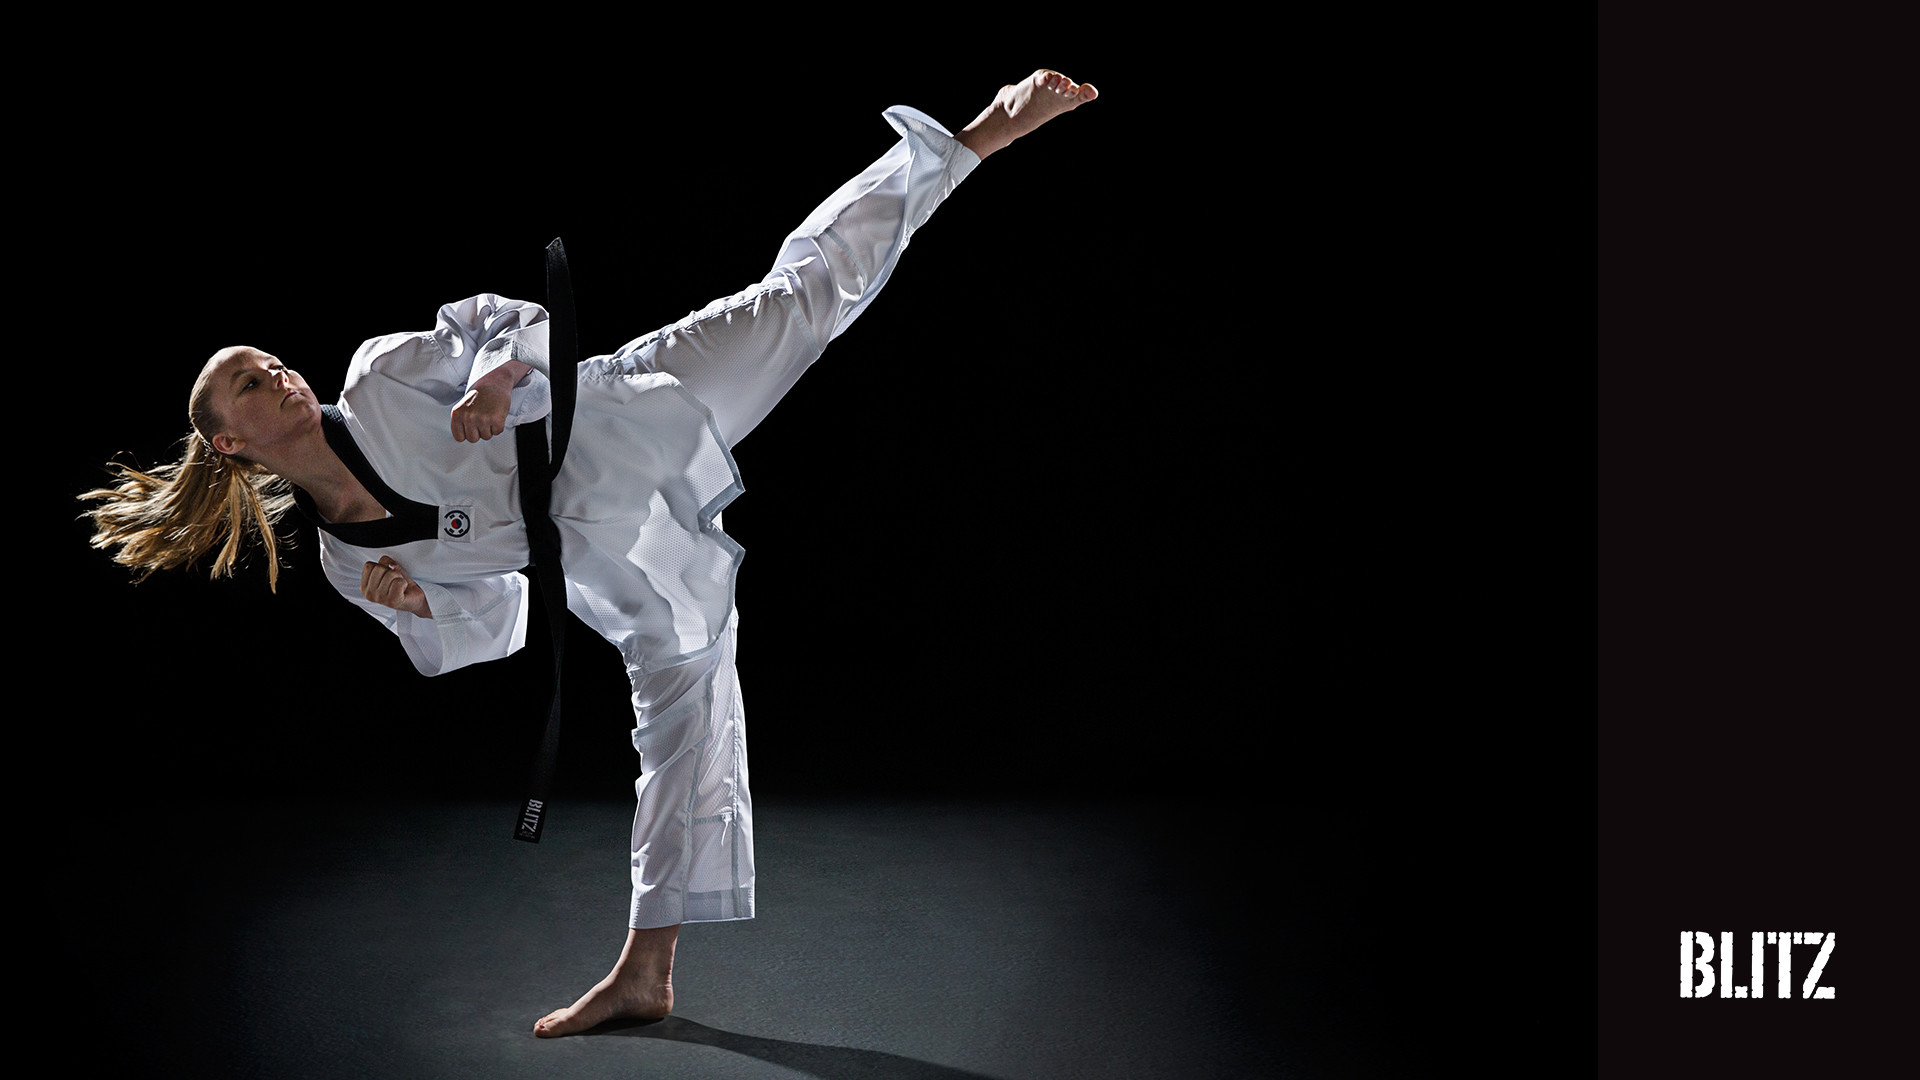 Taekwondo Quotes Wallpaper Martial Arts 70 Images